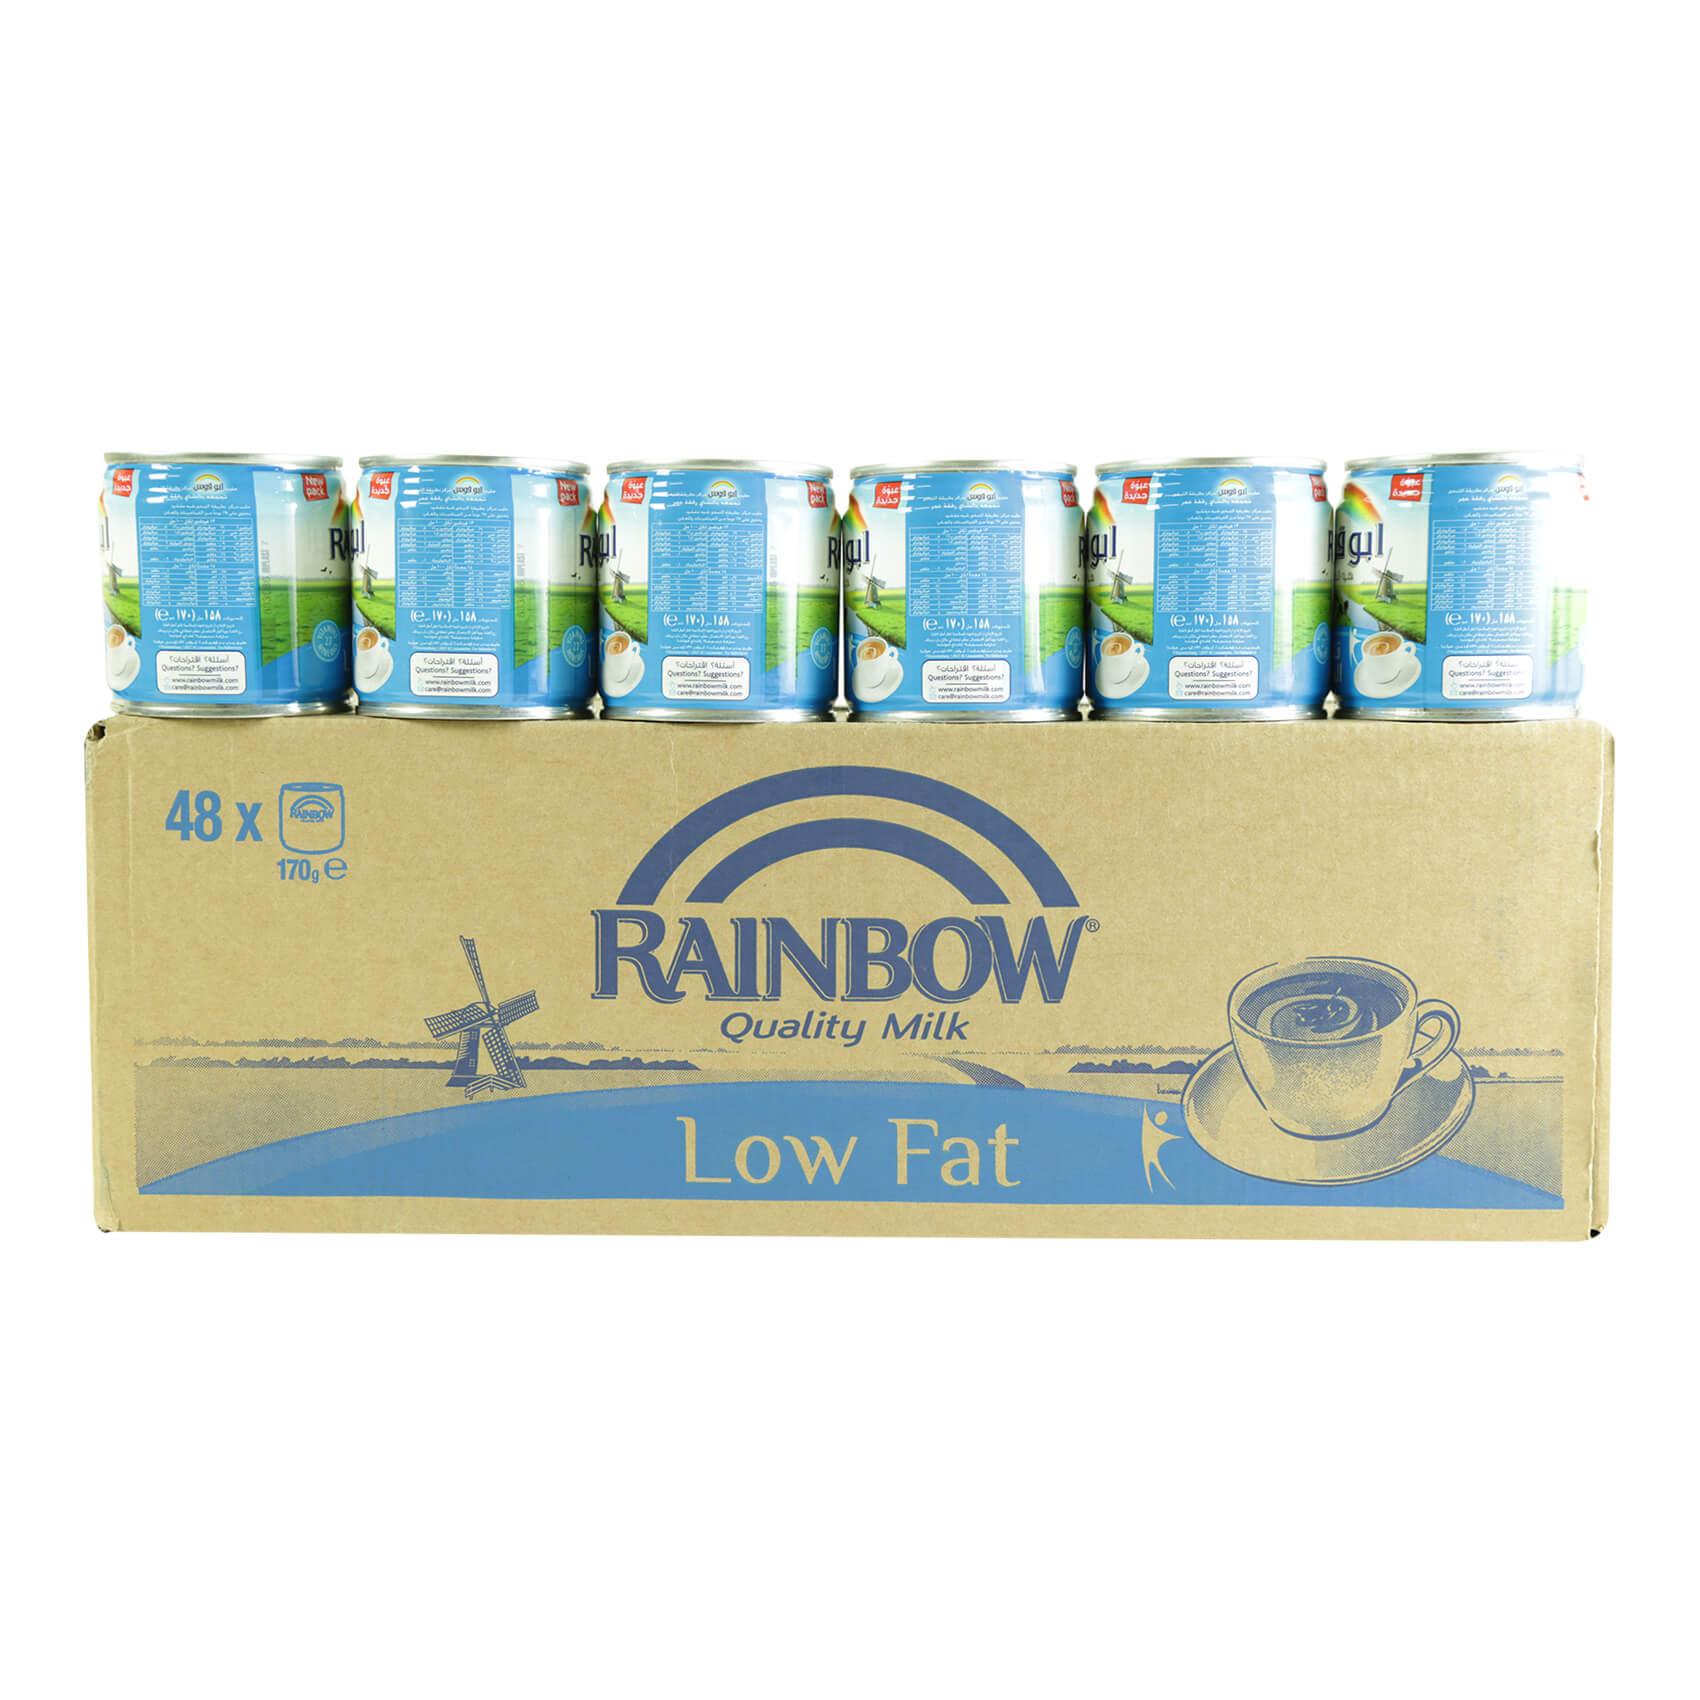 RAINBOW EVAP MILK LIGHT 170GRX48